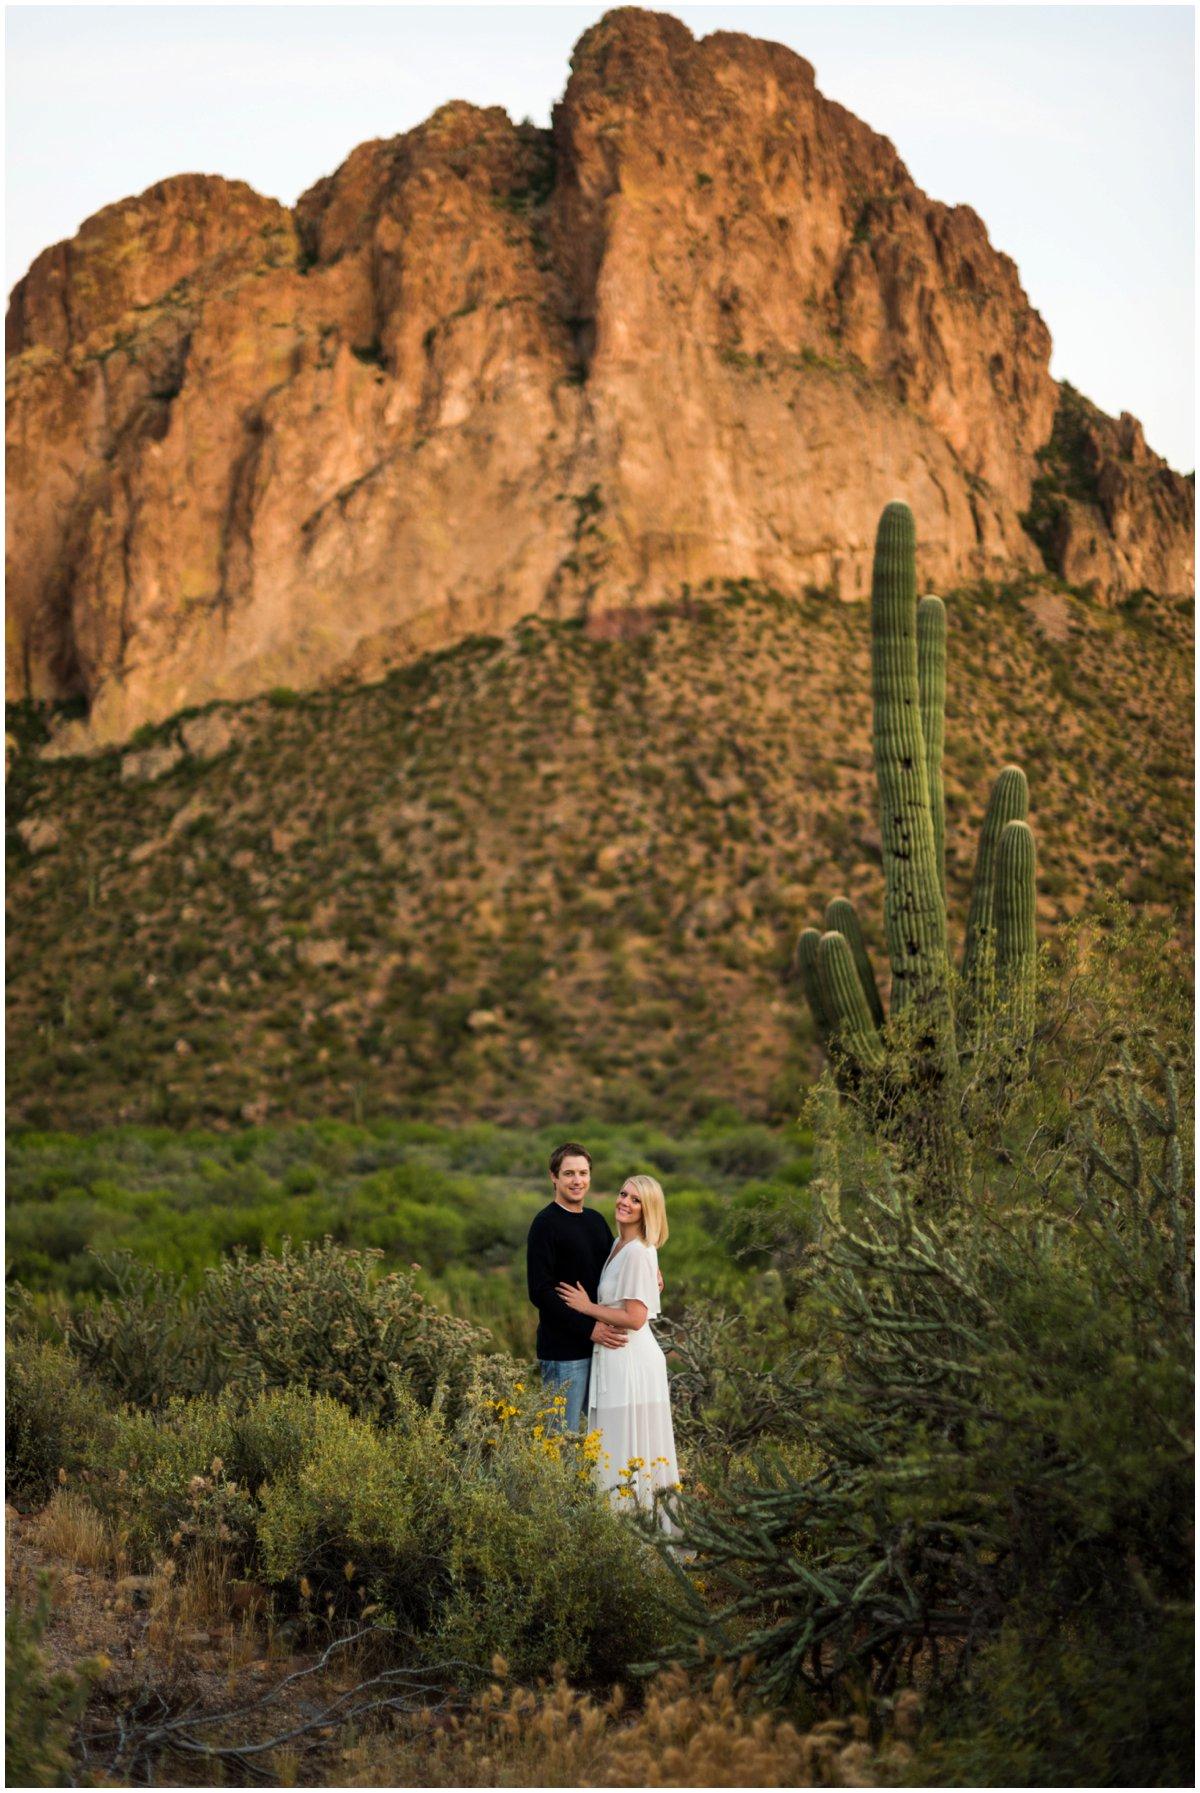 Sunset Salt River Engagement Photos in the Arizona Desert by Saguaro Lake.